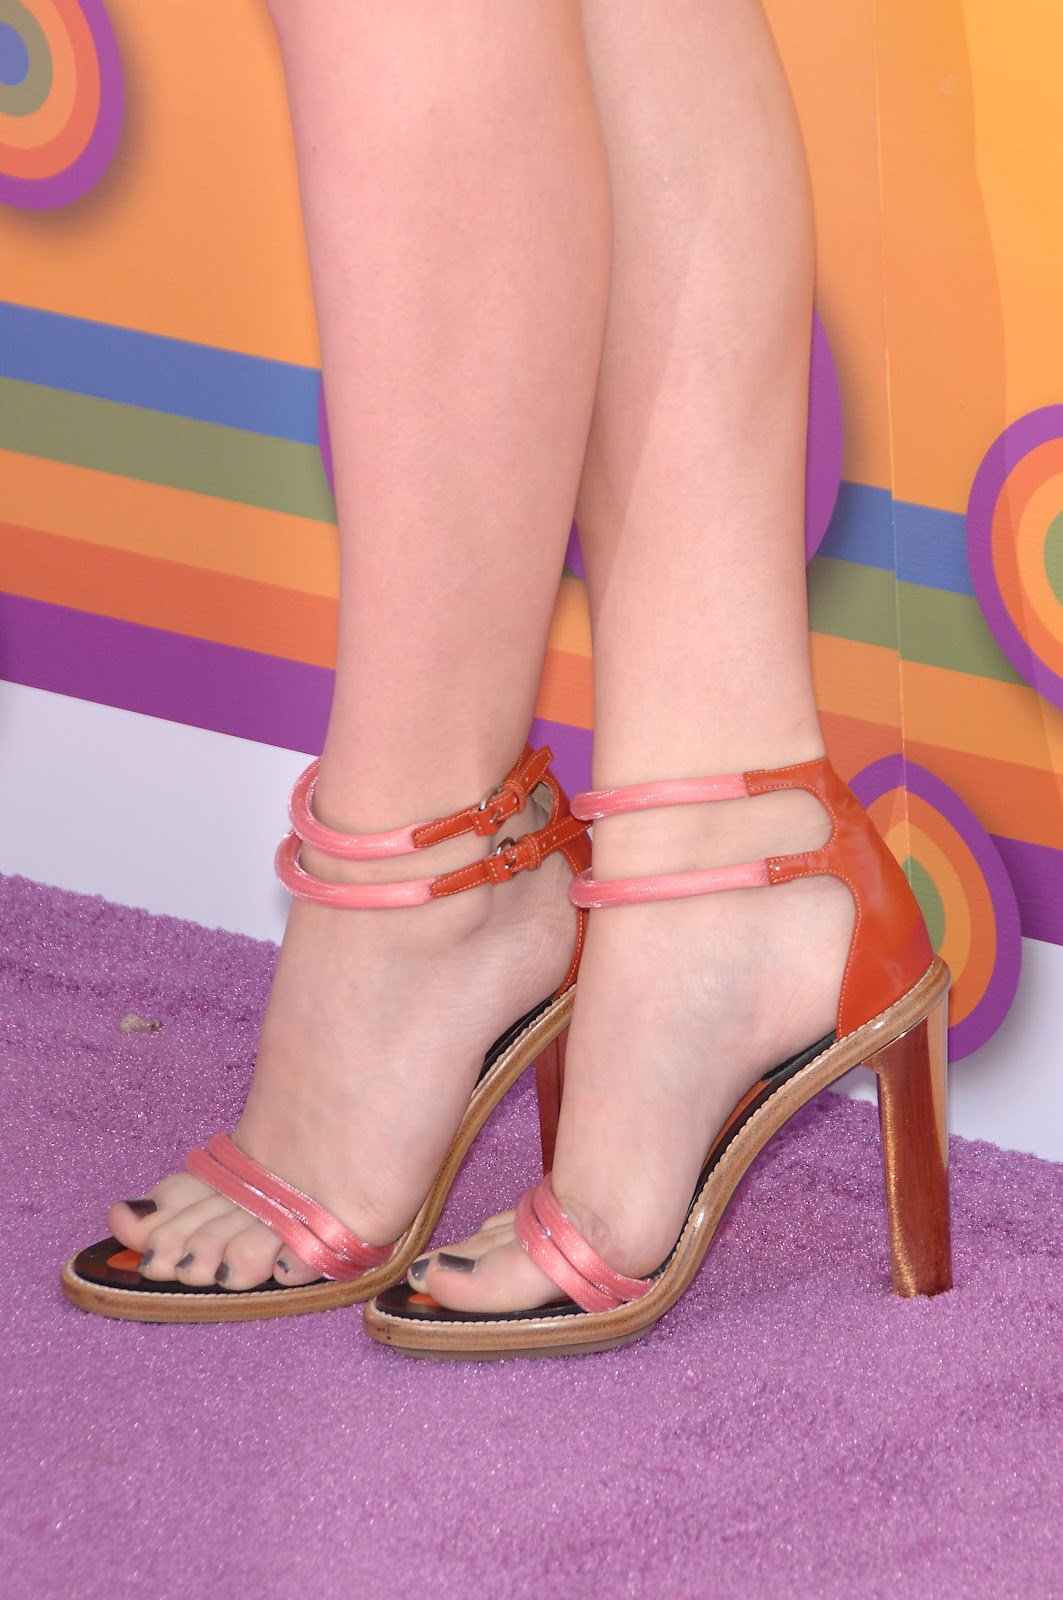 Chloe Grace Moretz - Foot Fetish: Chloe Moretz @ Variety's ...